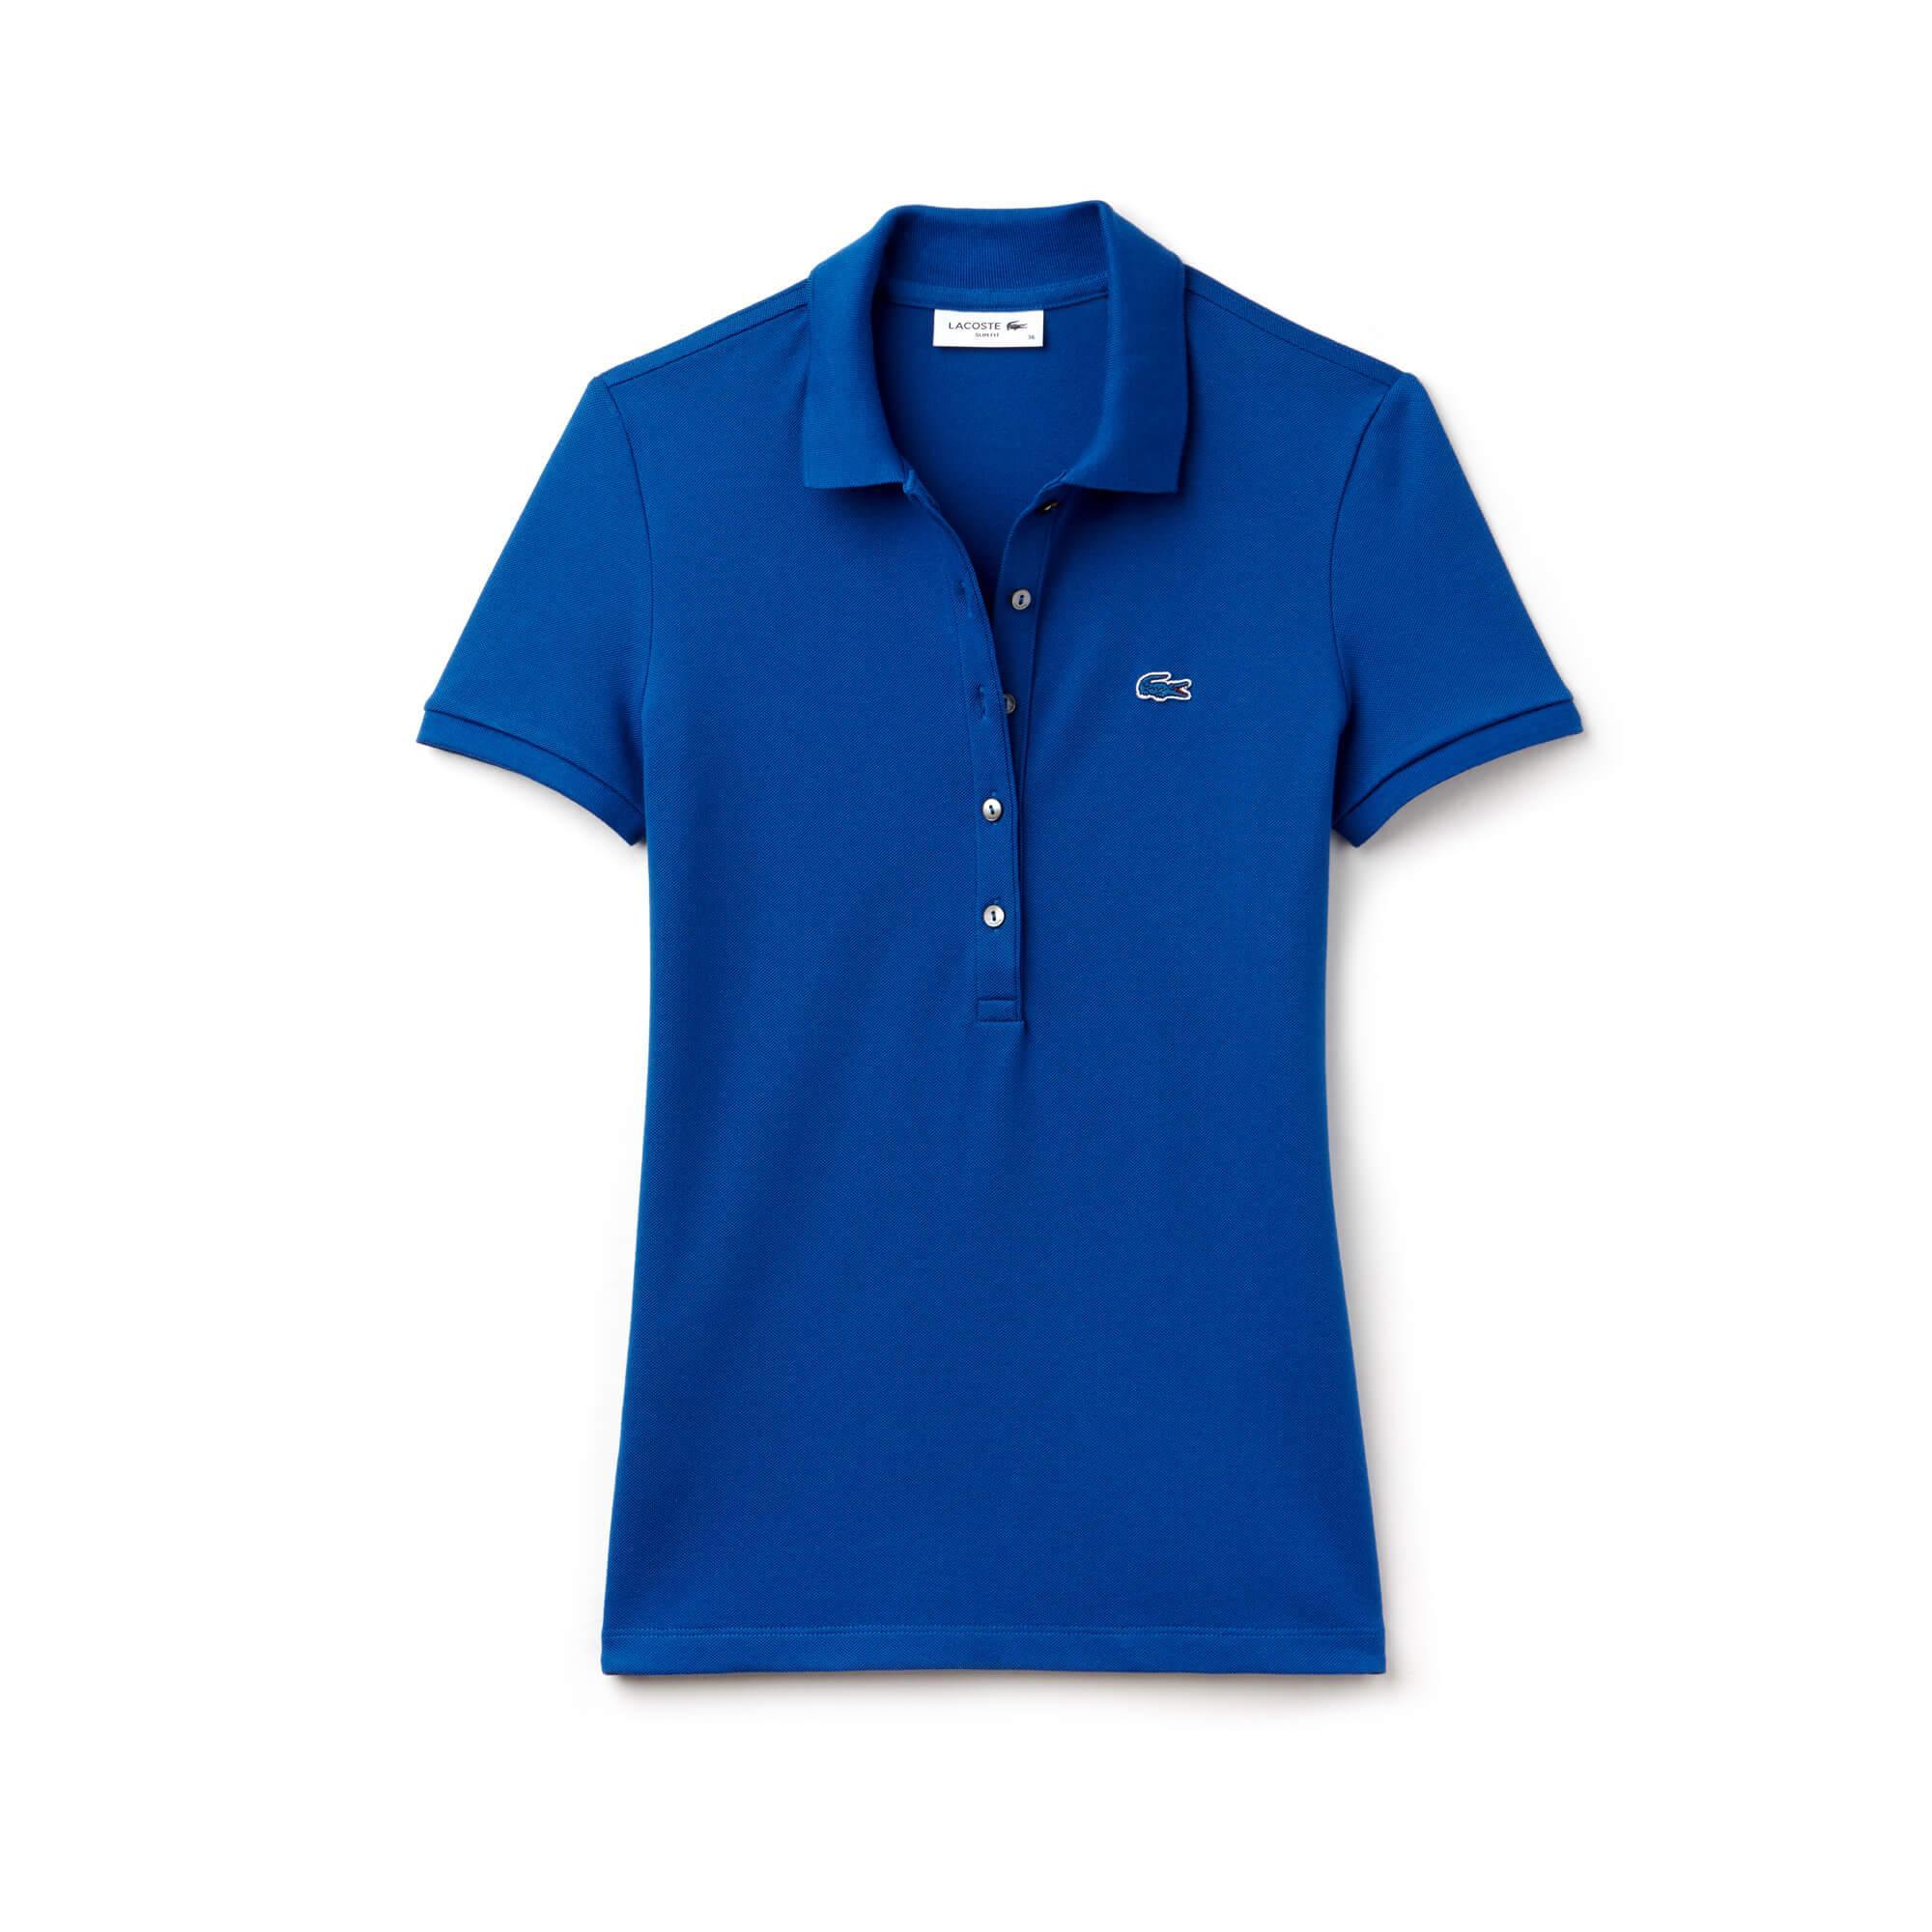 Lacoste Kadın Mavi Slim Fit Polo